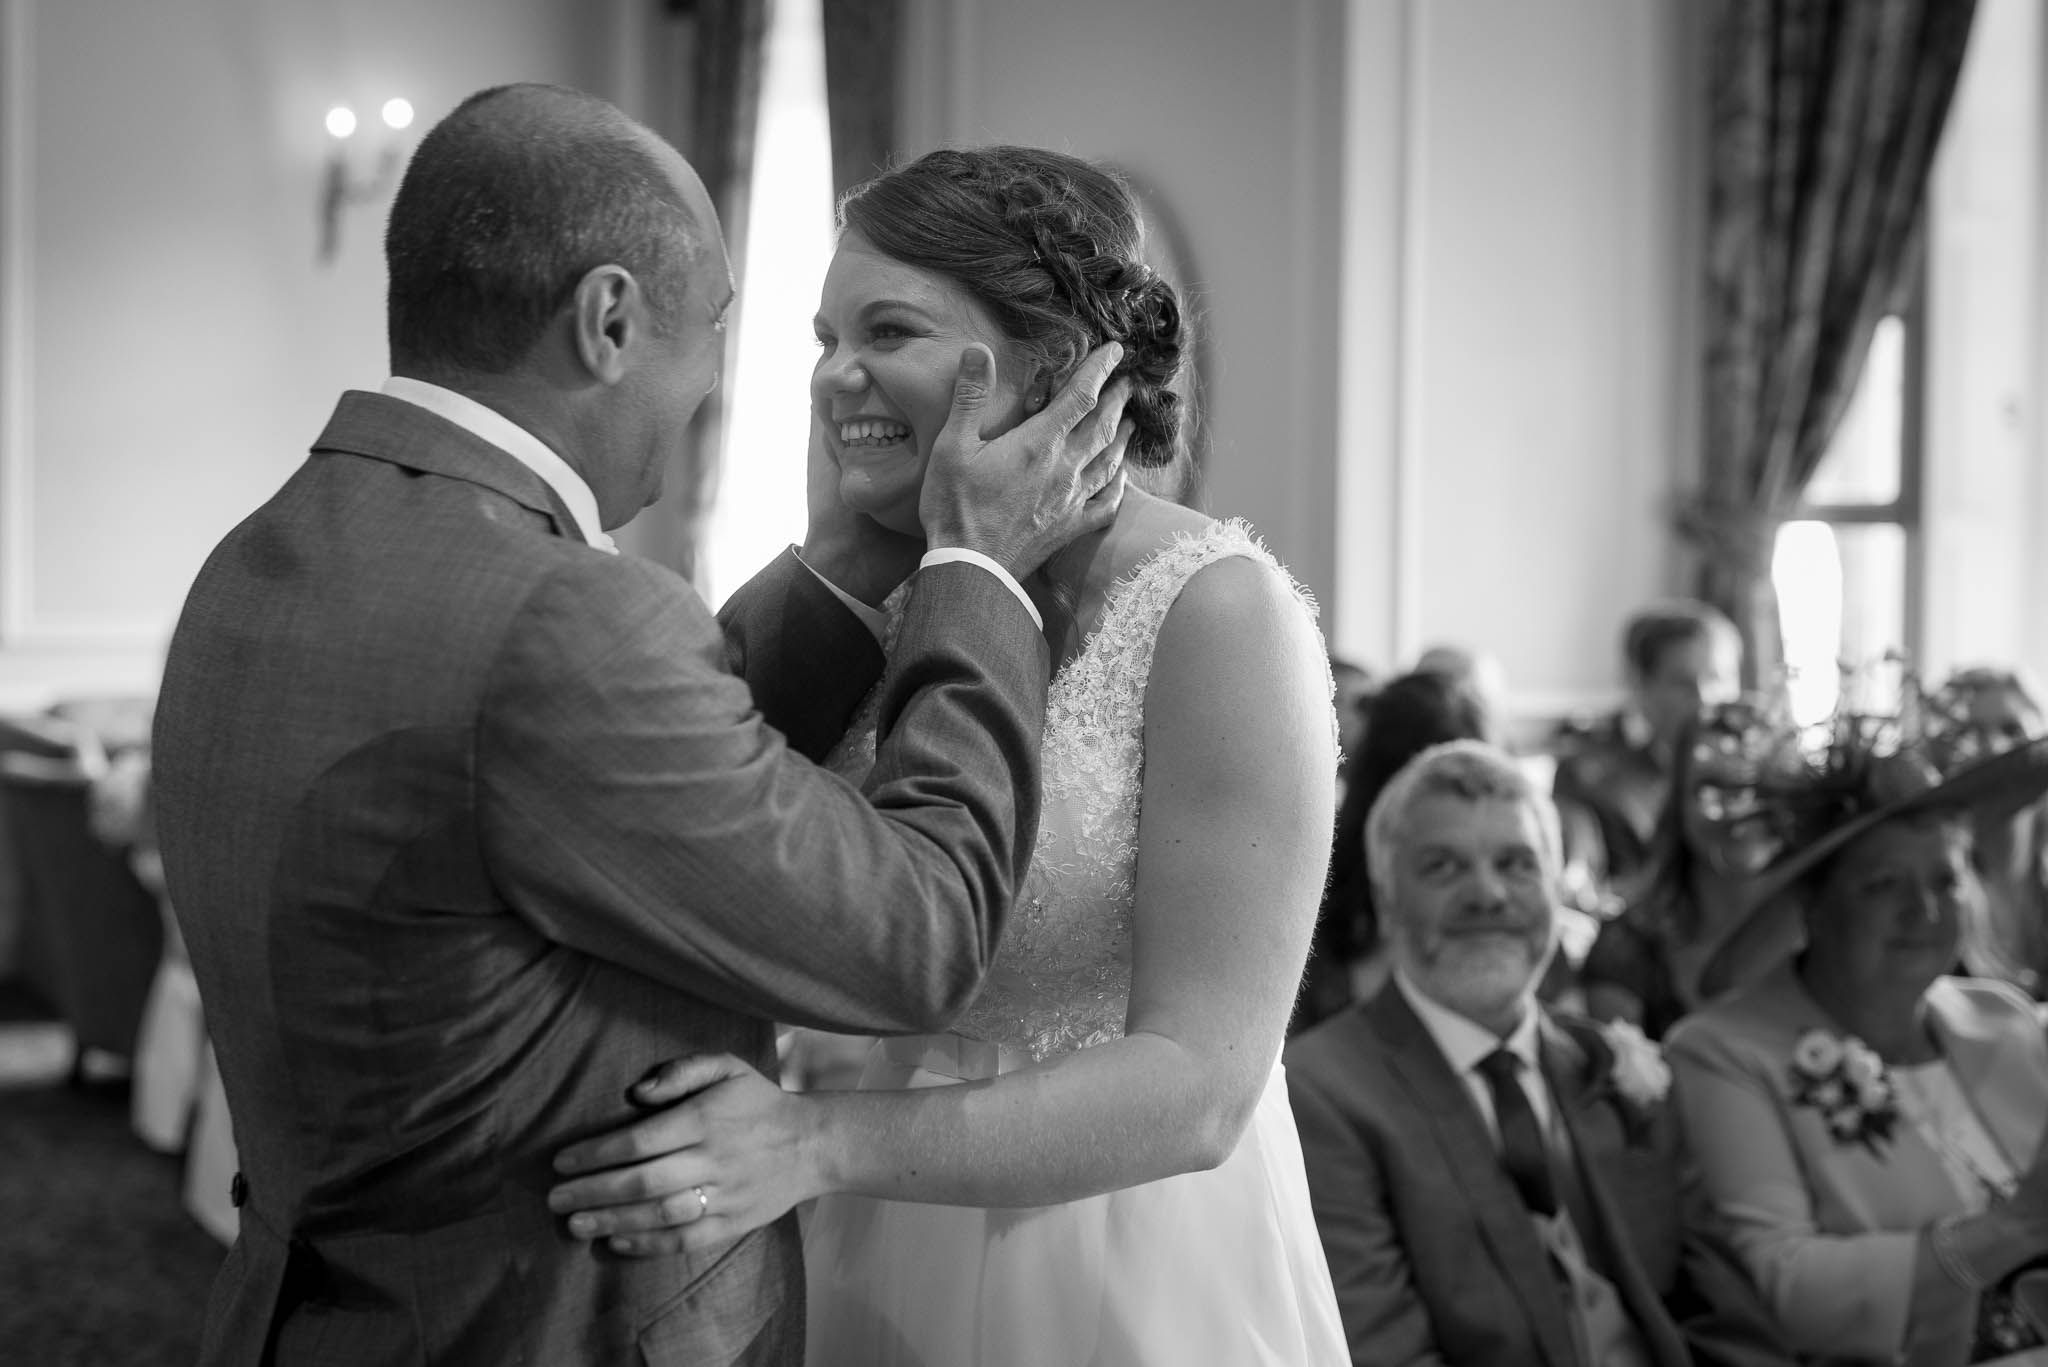 Crathorne Hall Hotel Wedding Photographer56.jpg